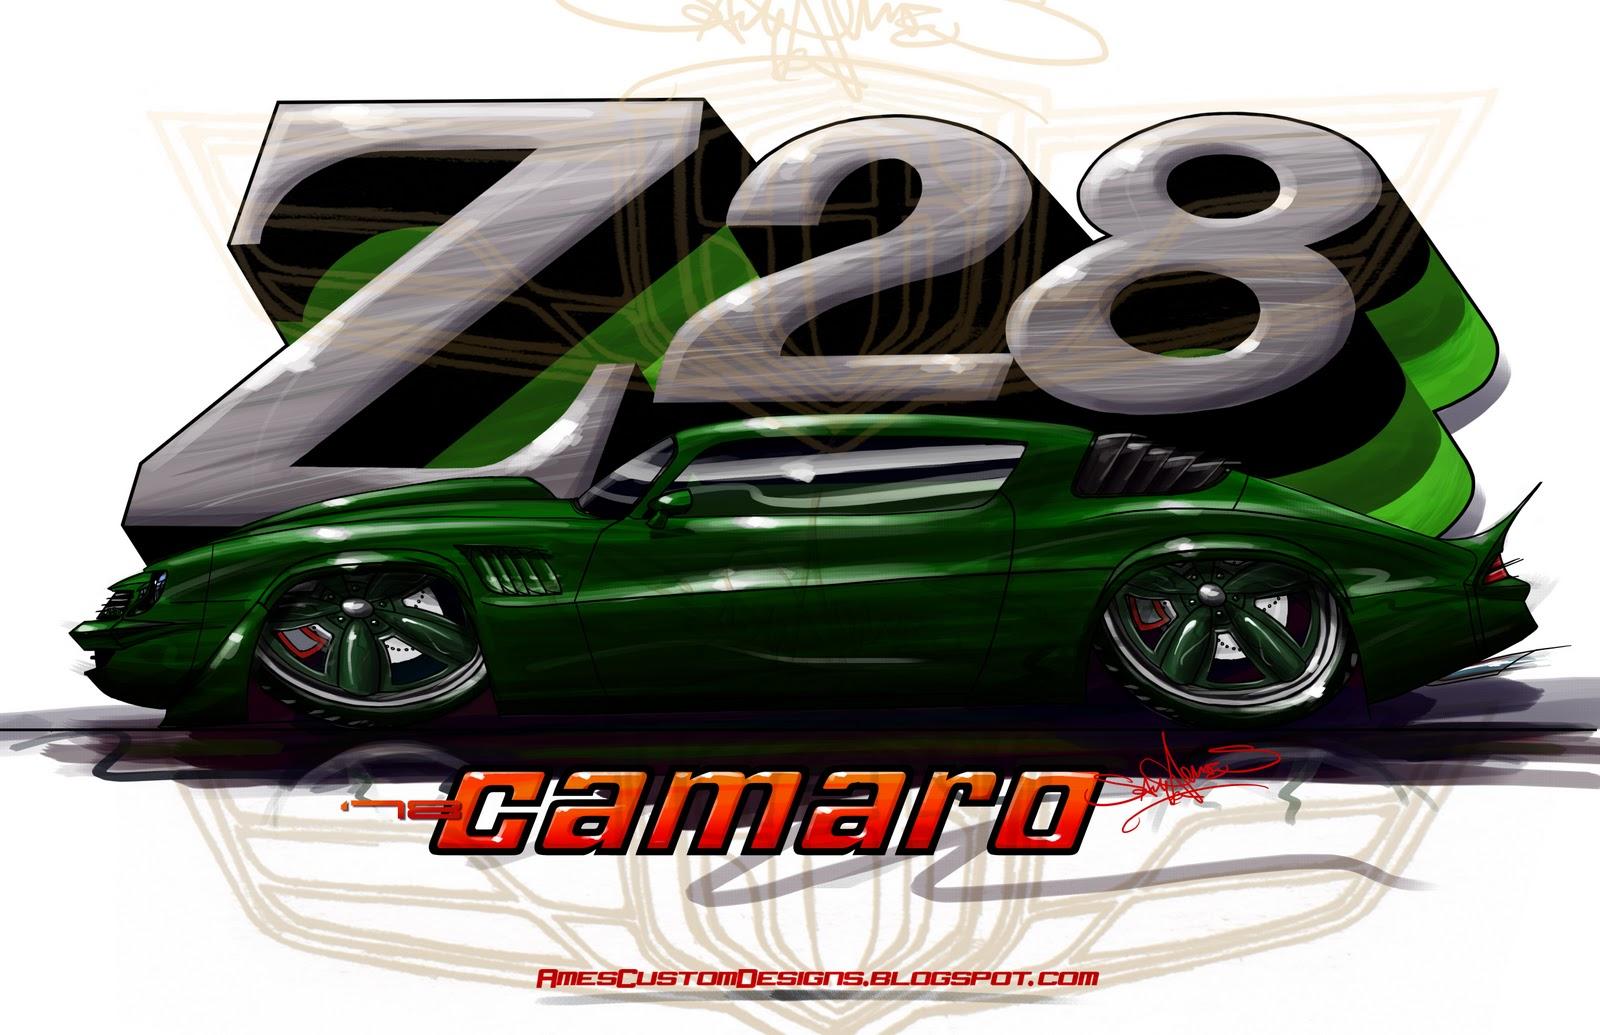 Sam ames january 2011 for 1980 camaro rear window louvers